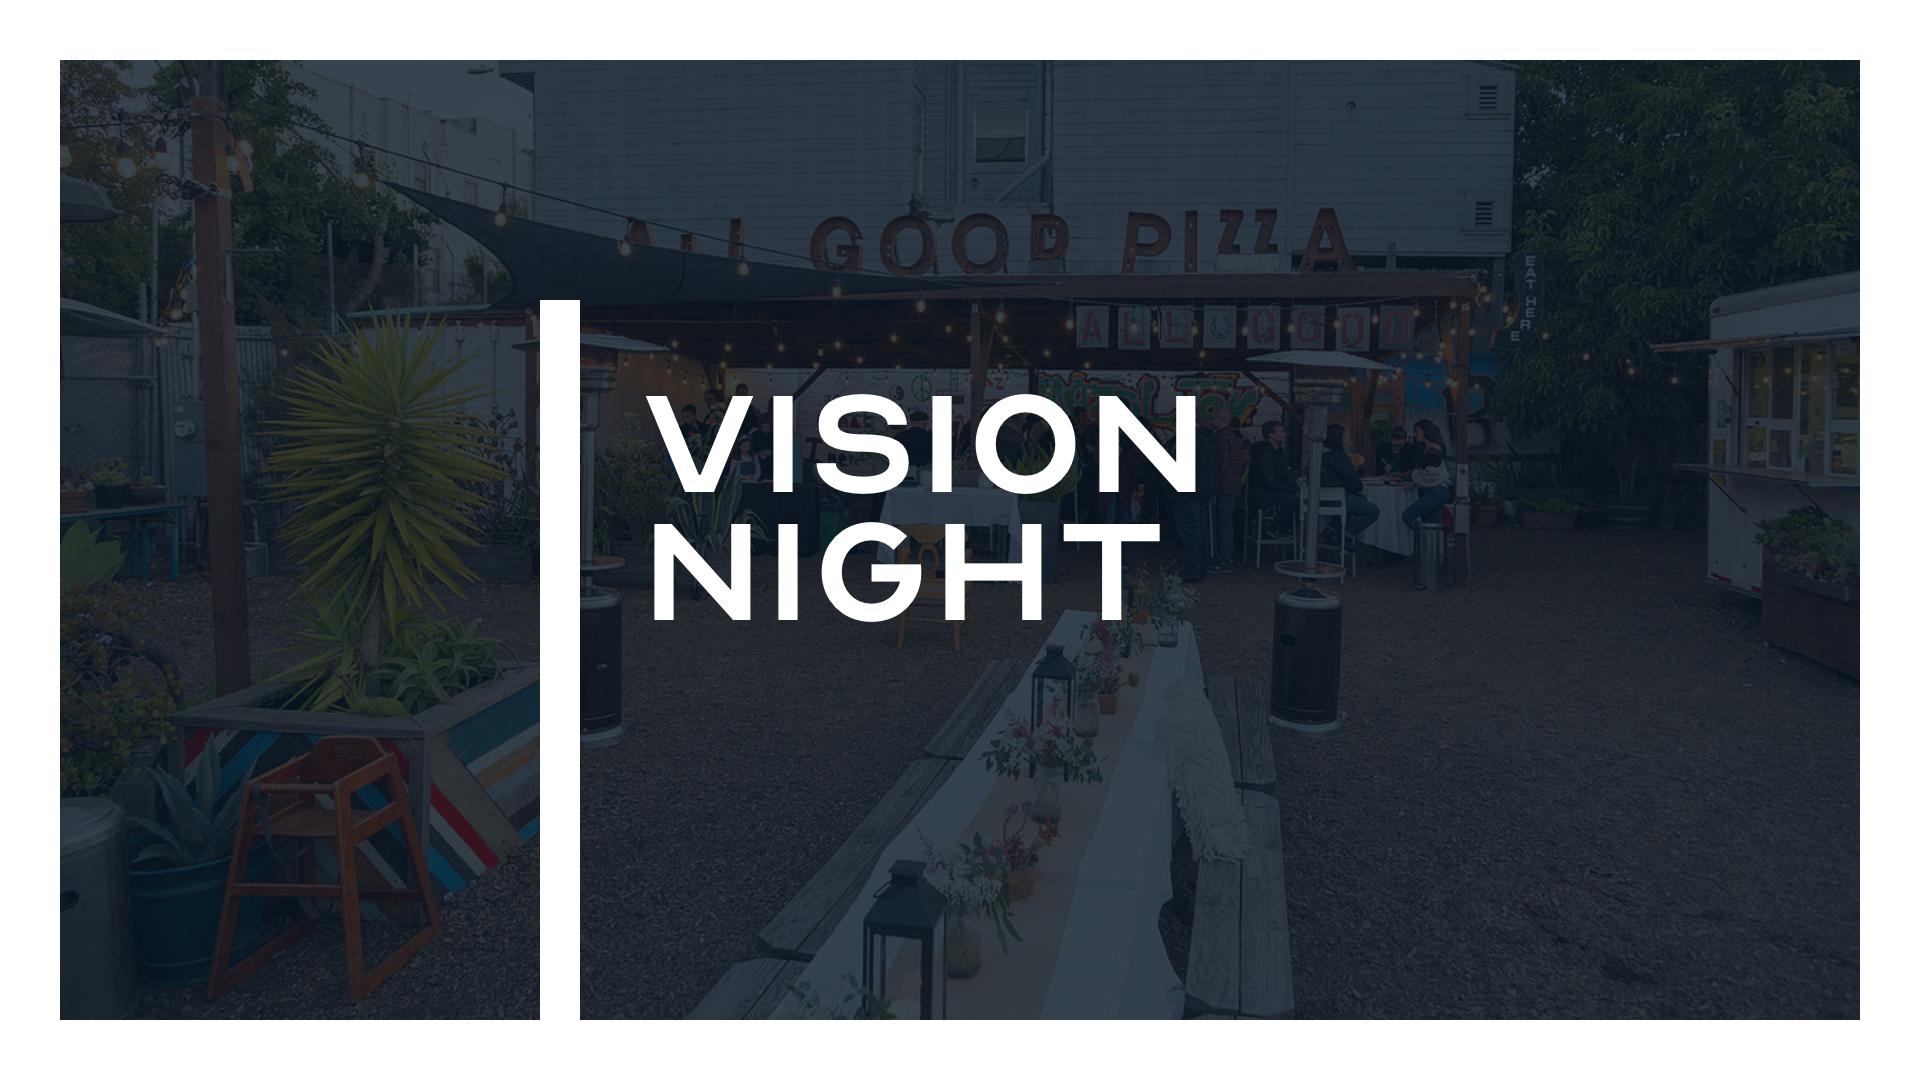 19-03-15-Vision-Night-HD.png